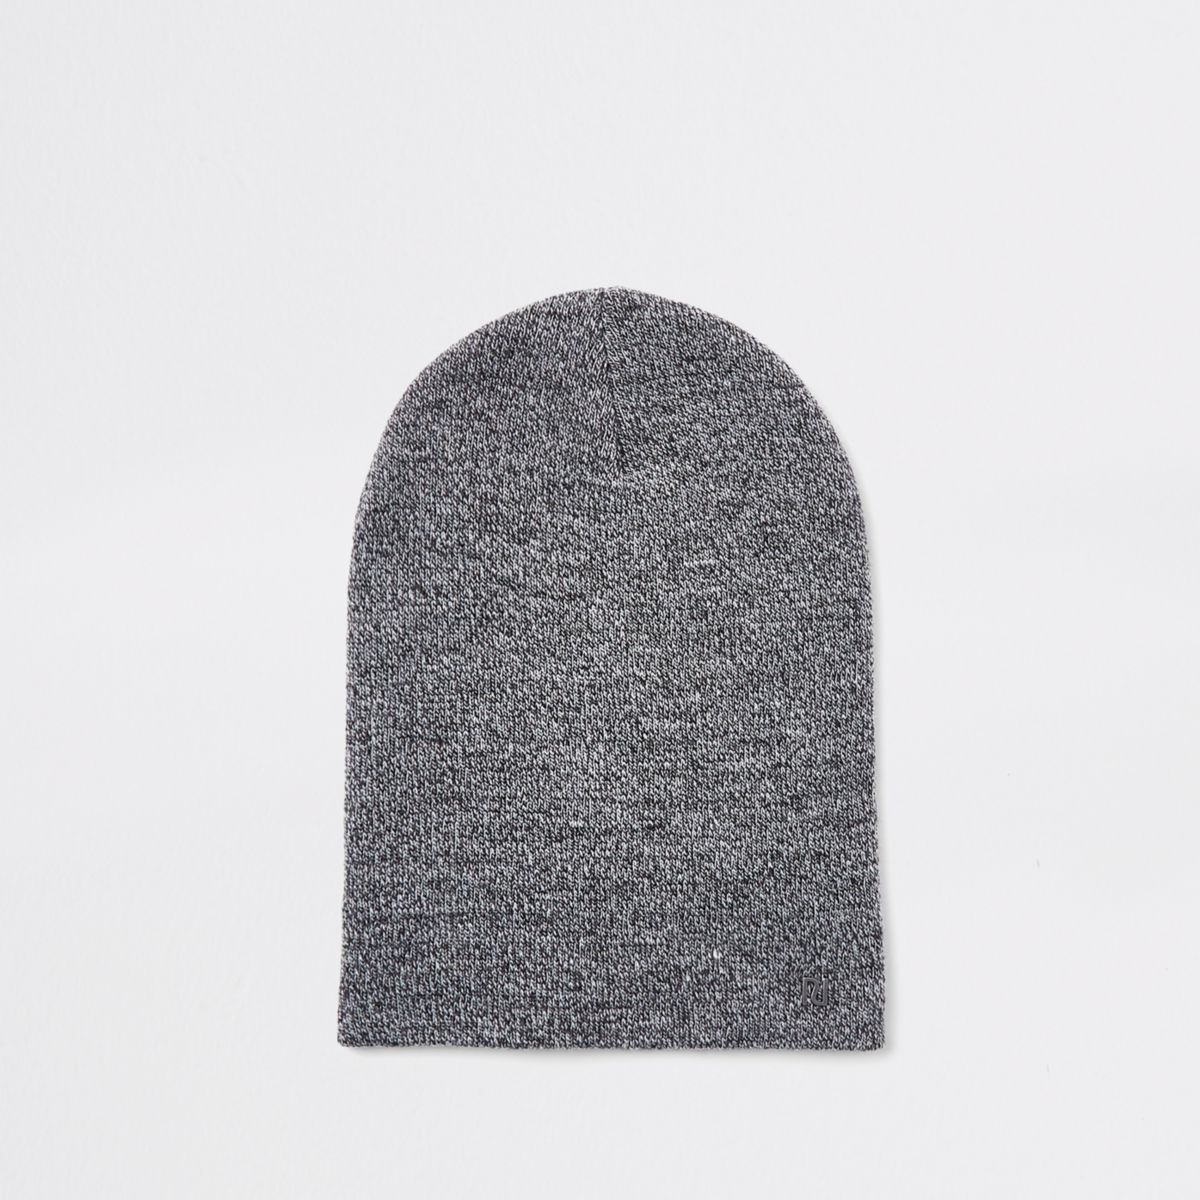 a8fe9f89b07 Floppy Beanie Hat